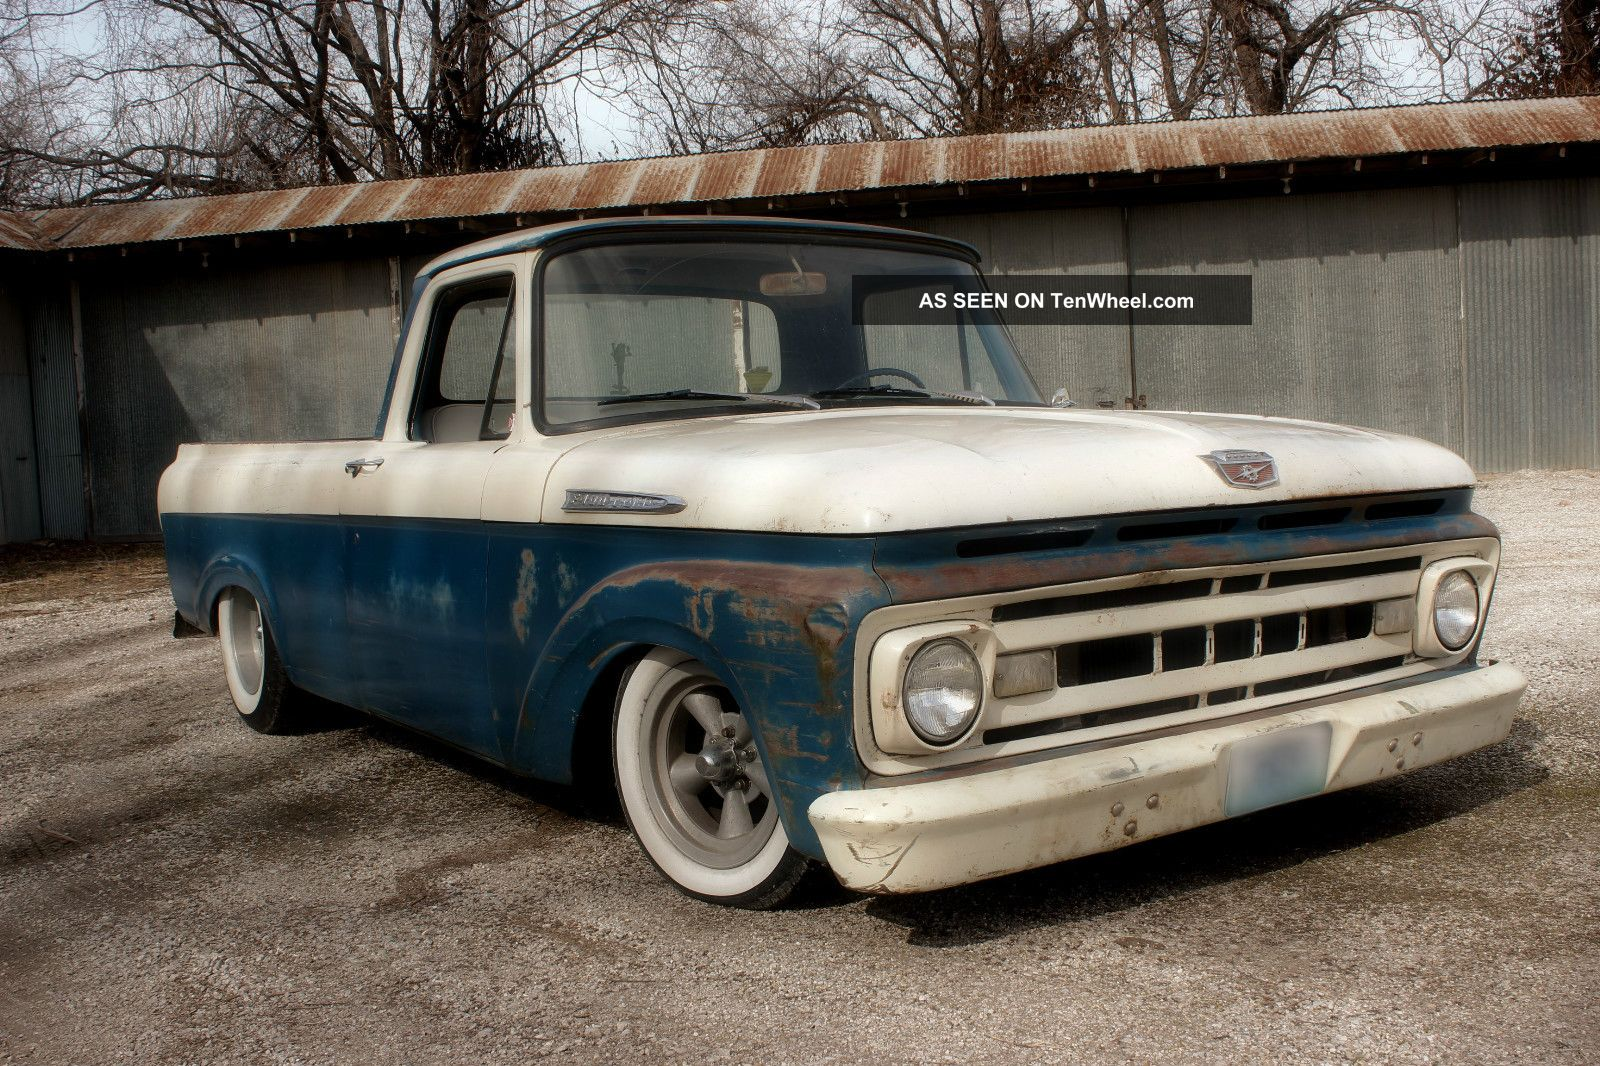 1961 Ford F100 Truck Shortbed Unibody Ratrod Hot Rod Custom Pickup F 100 Photo 4